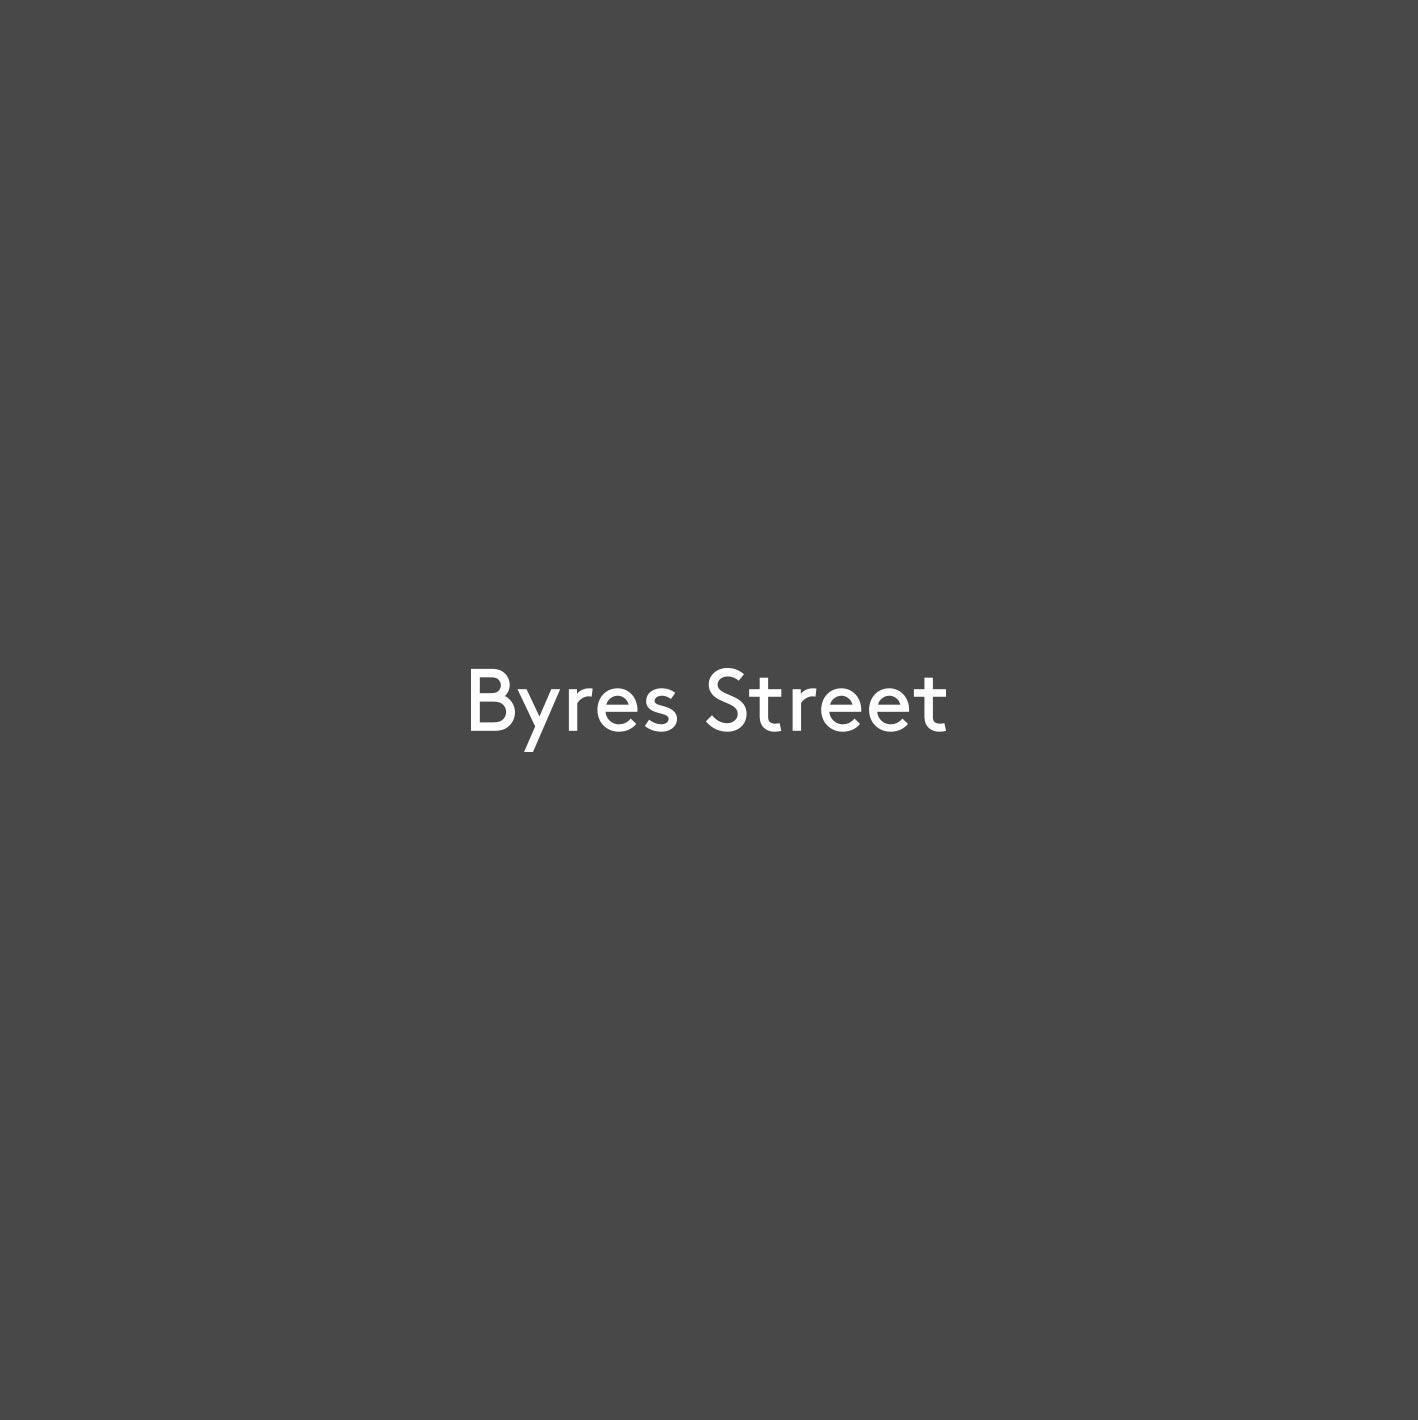 Synergy-Property-ByresStreet.jpg